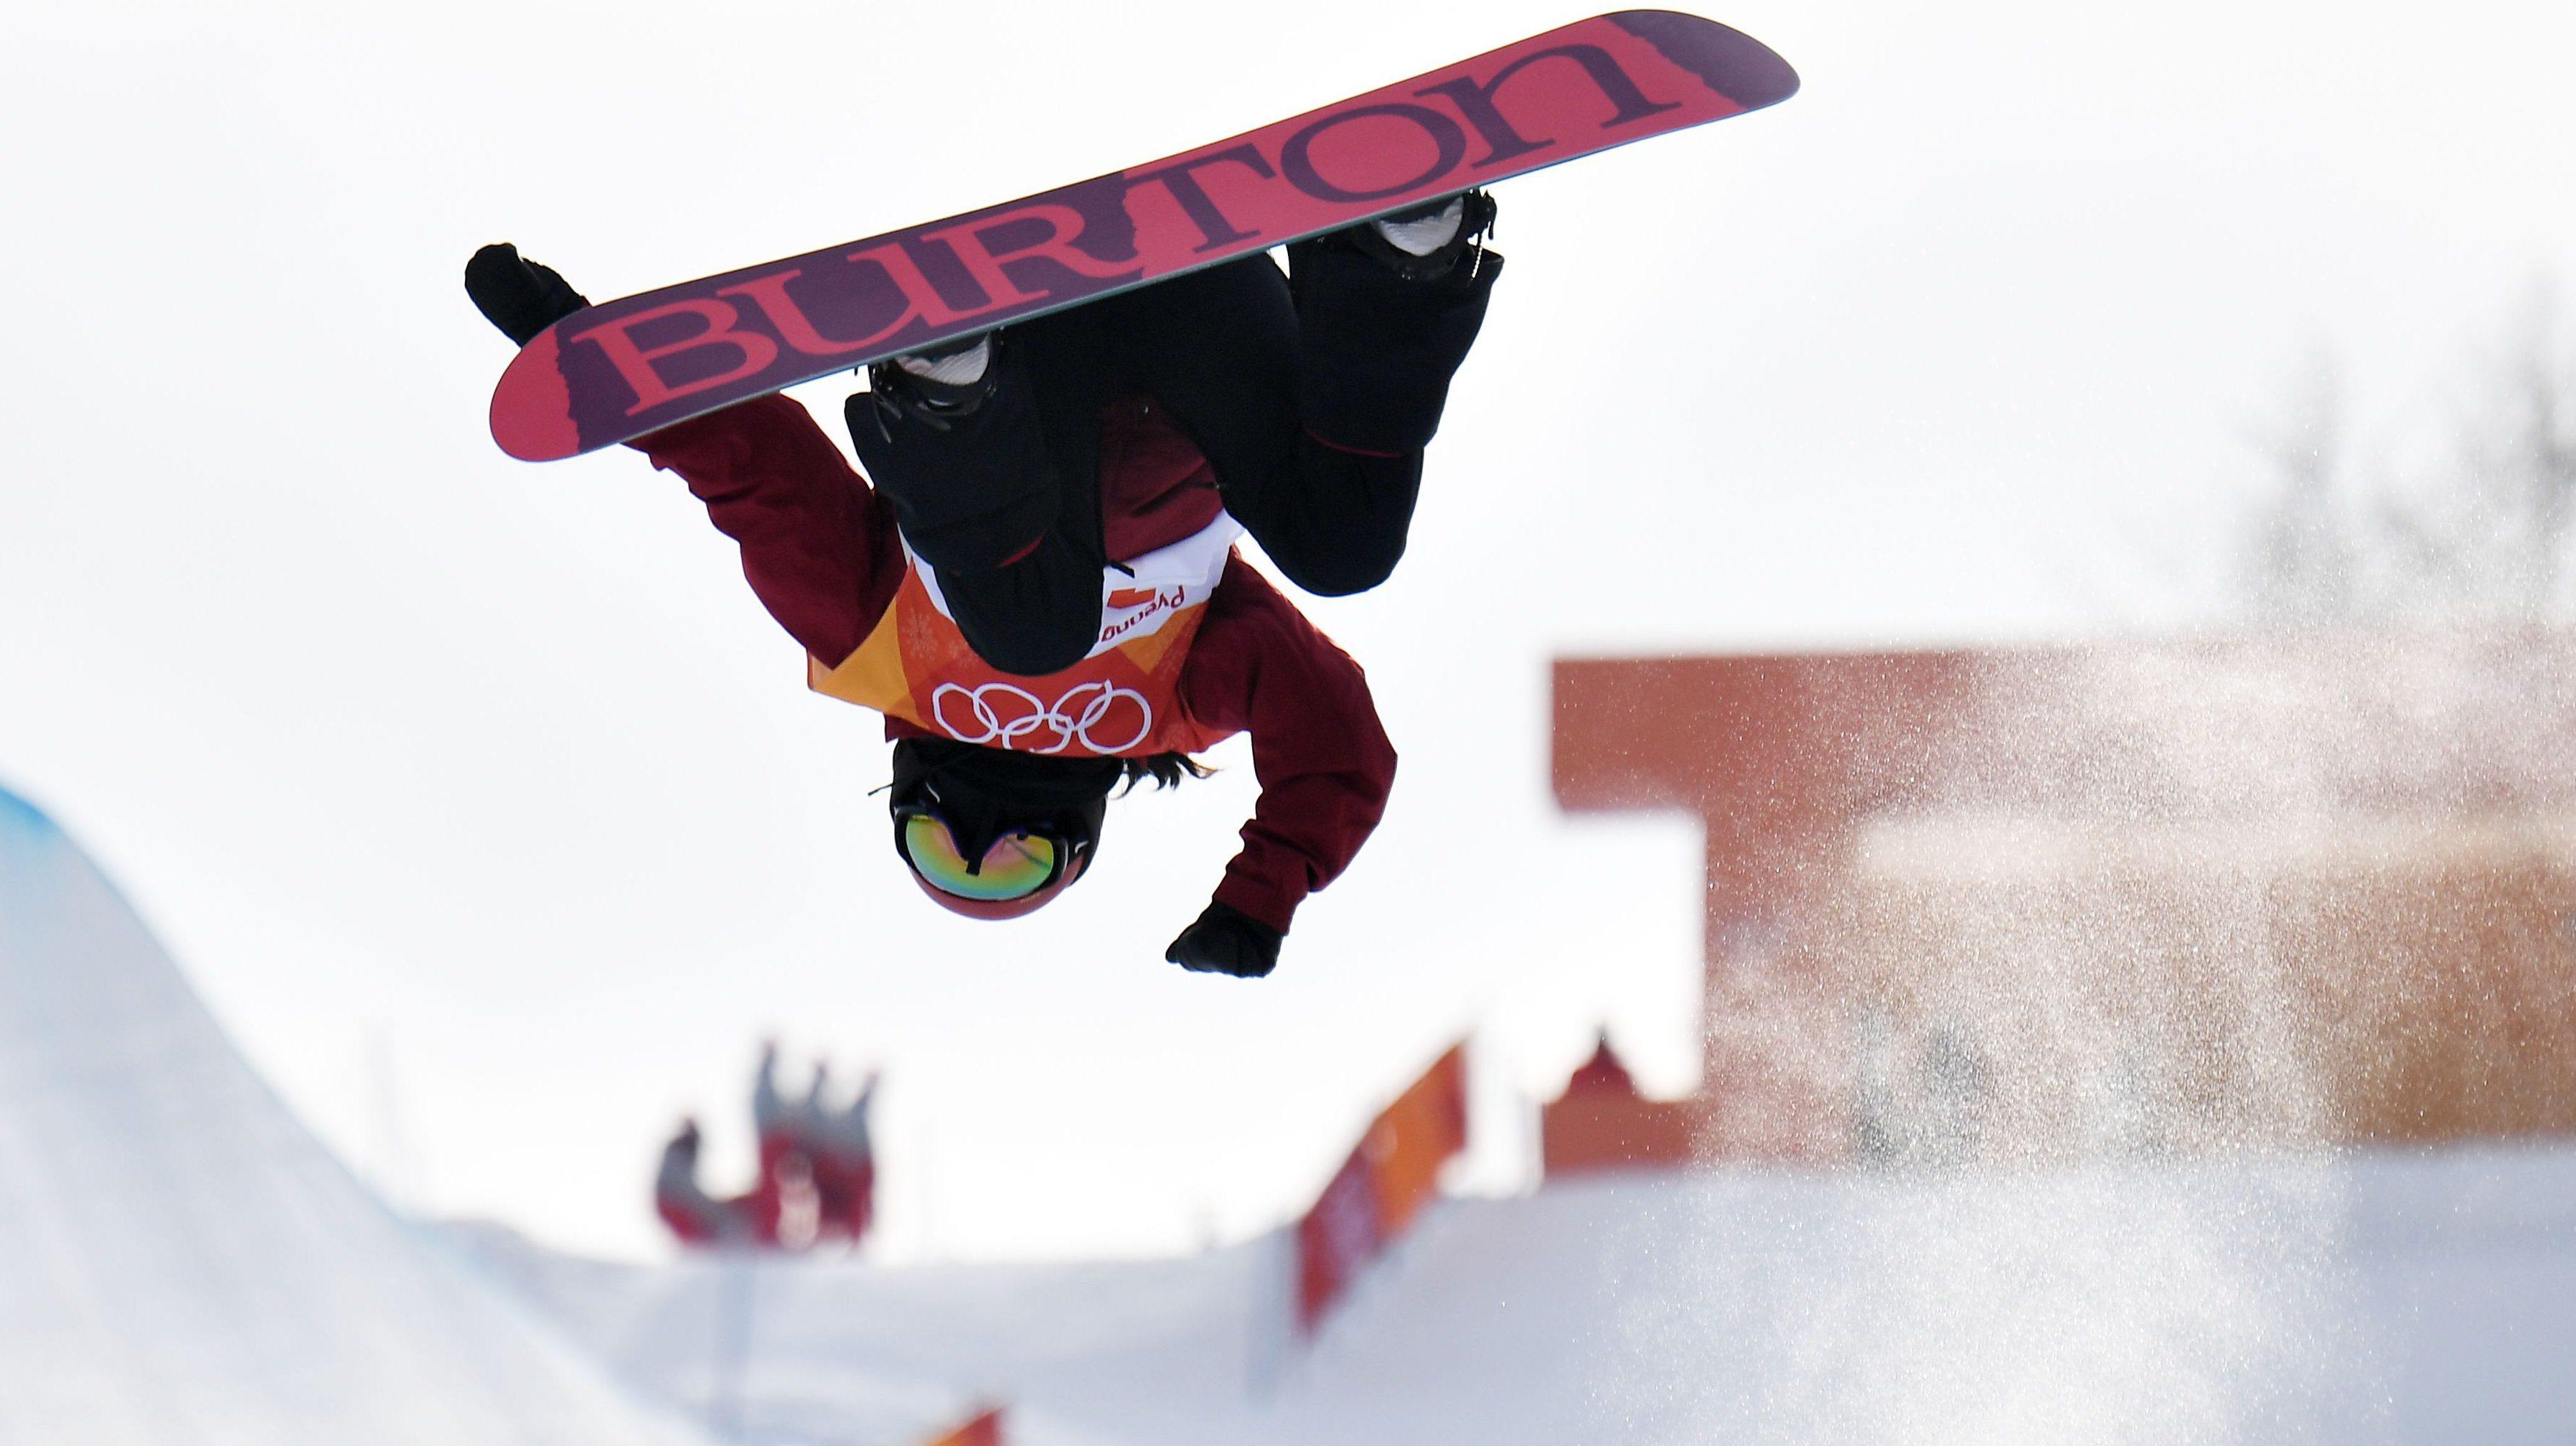 Halfpipe Snowboarding